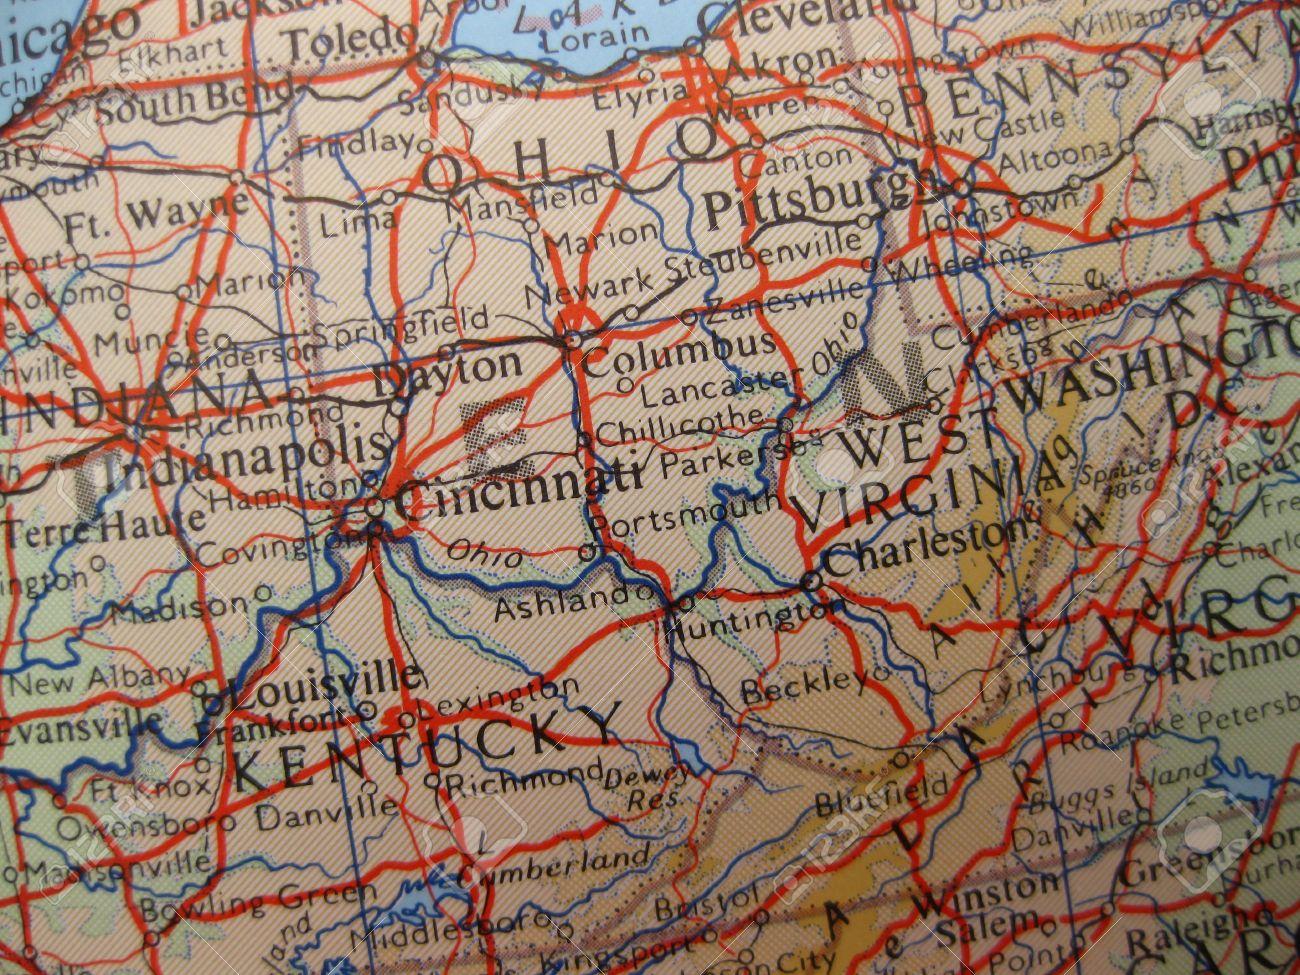 Map Of Kentucky Ohio And West Virginia Stock Photo Picture And - Map of west virginia and ohio